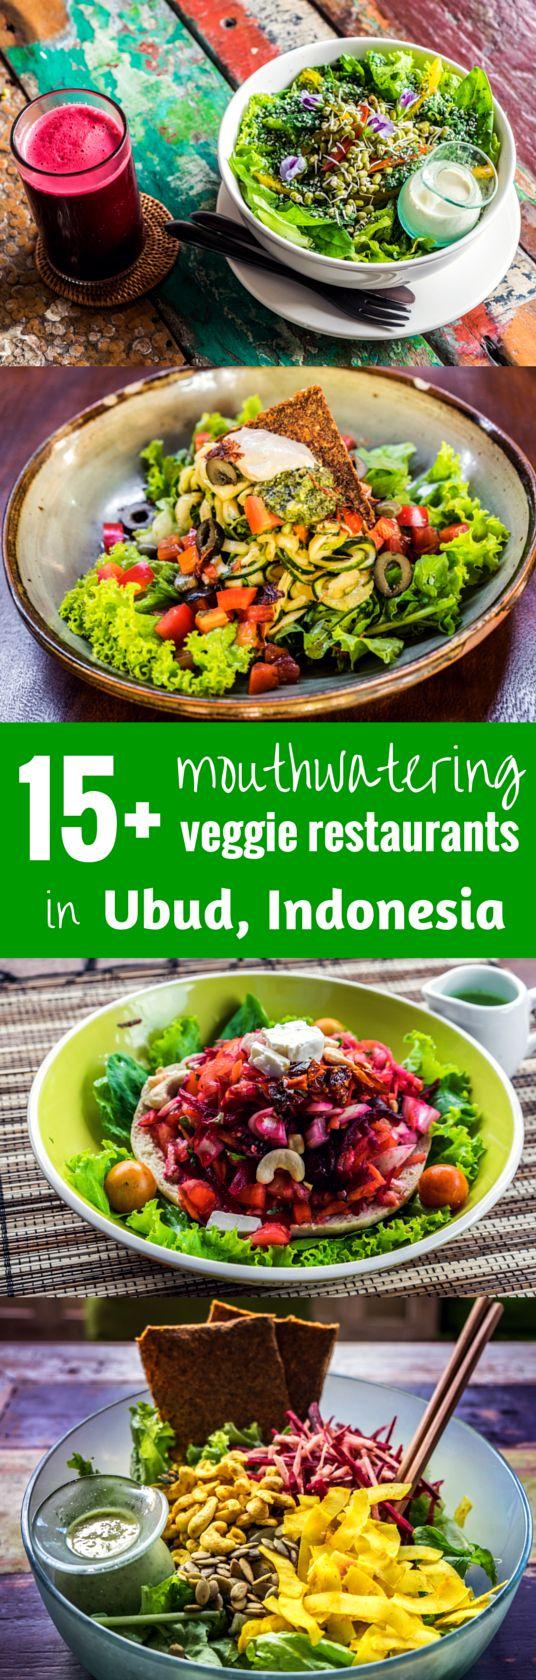 Bali indonesia, Restaurant and Vegetarian restaurants on